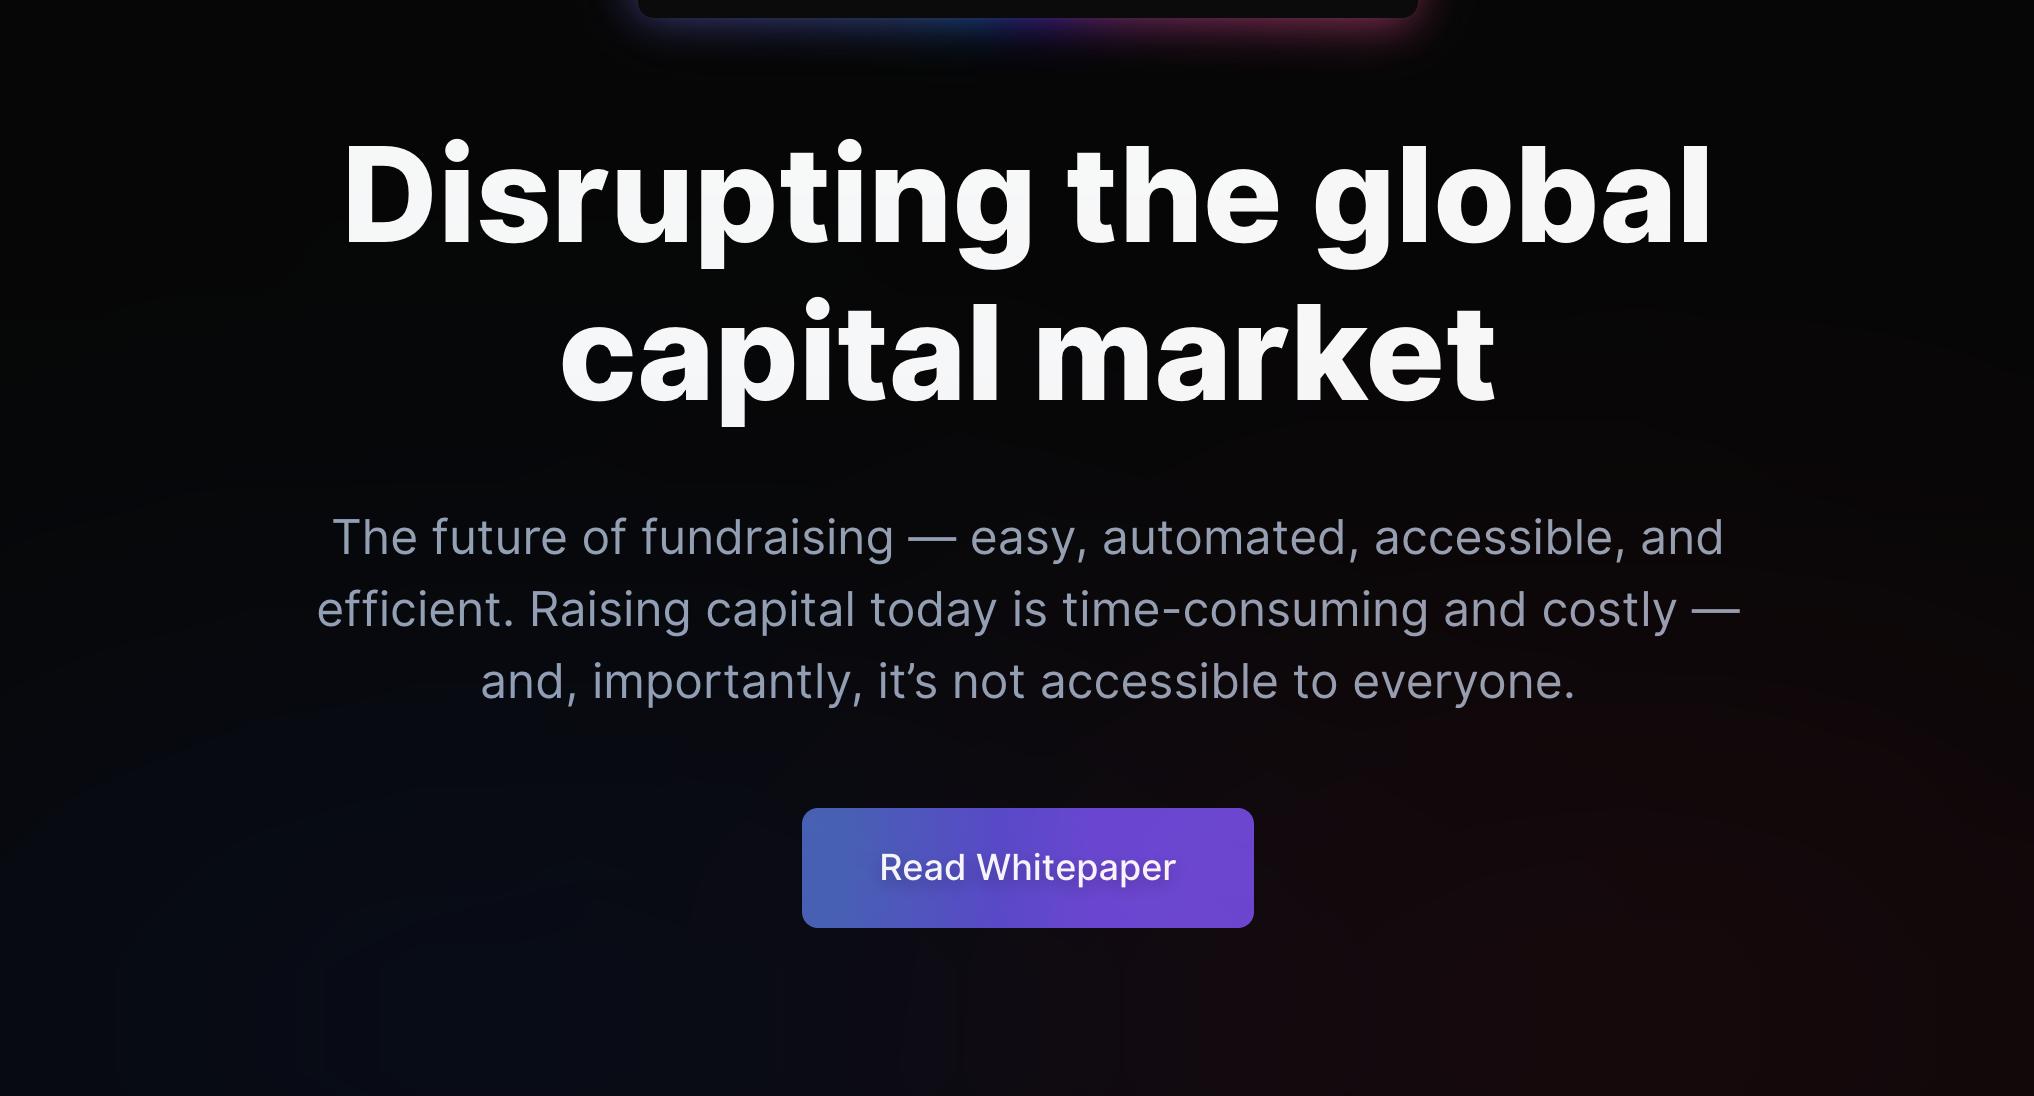 AssetFi - Tokenized Real Assets on the Blockchain Launching Soon